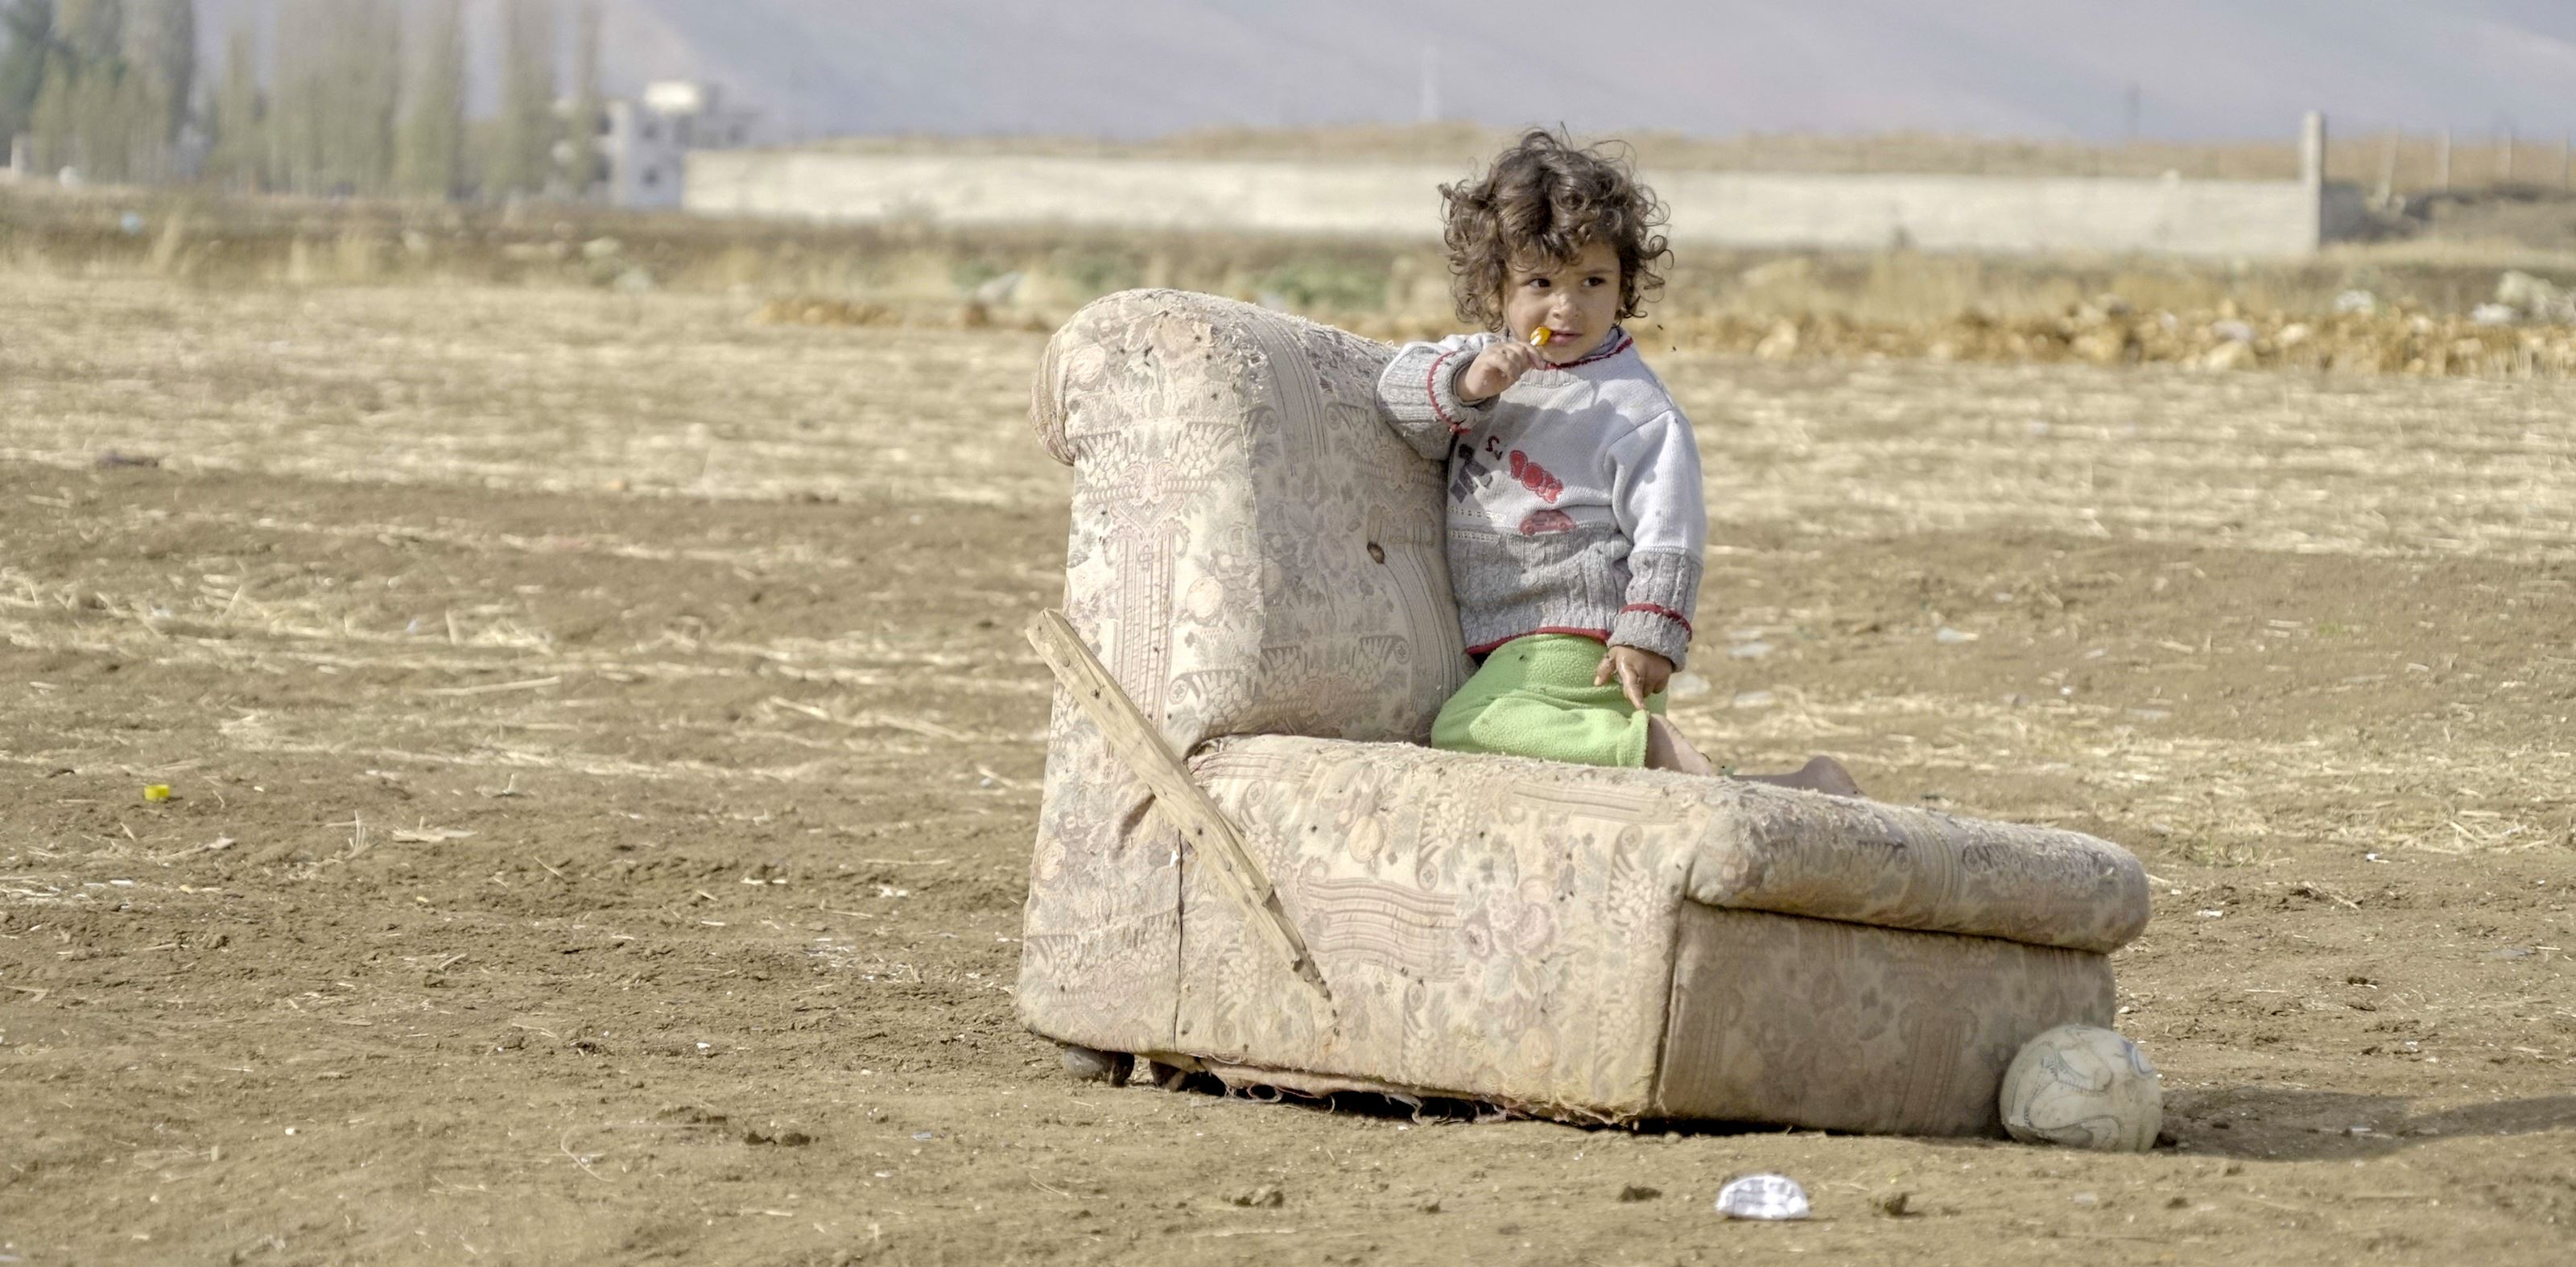 Emergencia en Siria